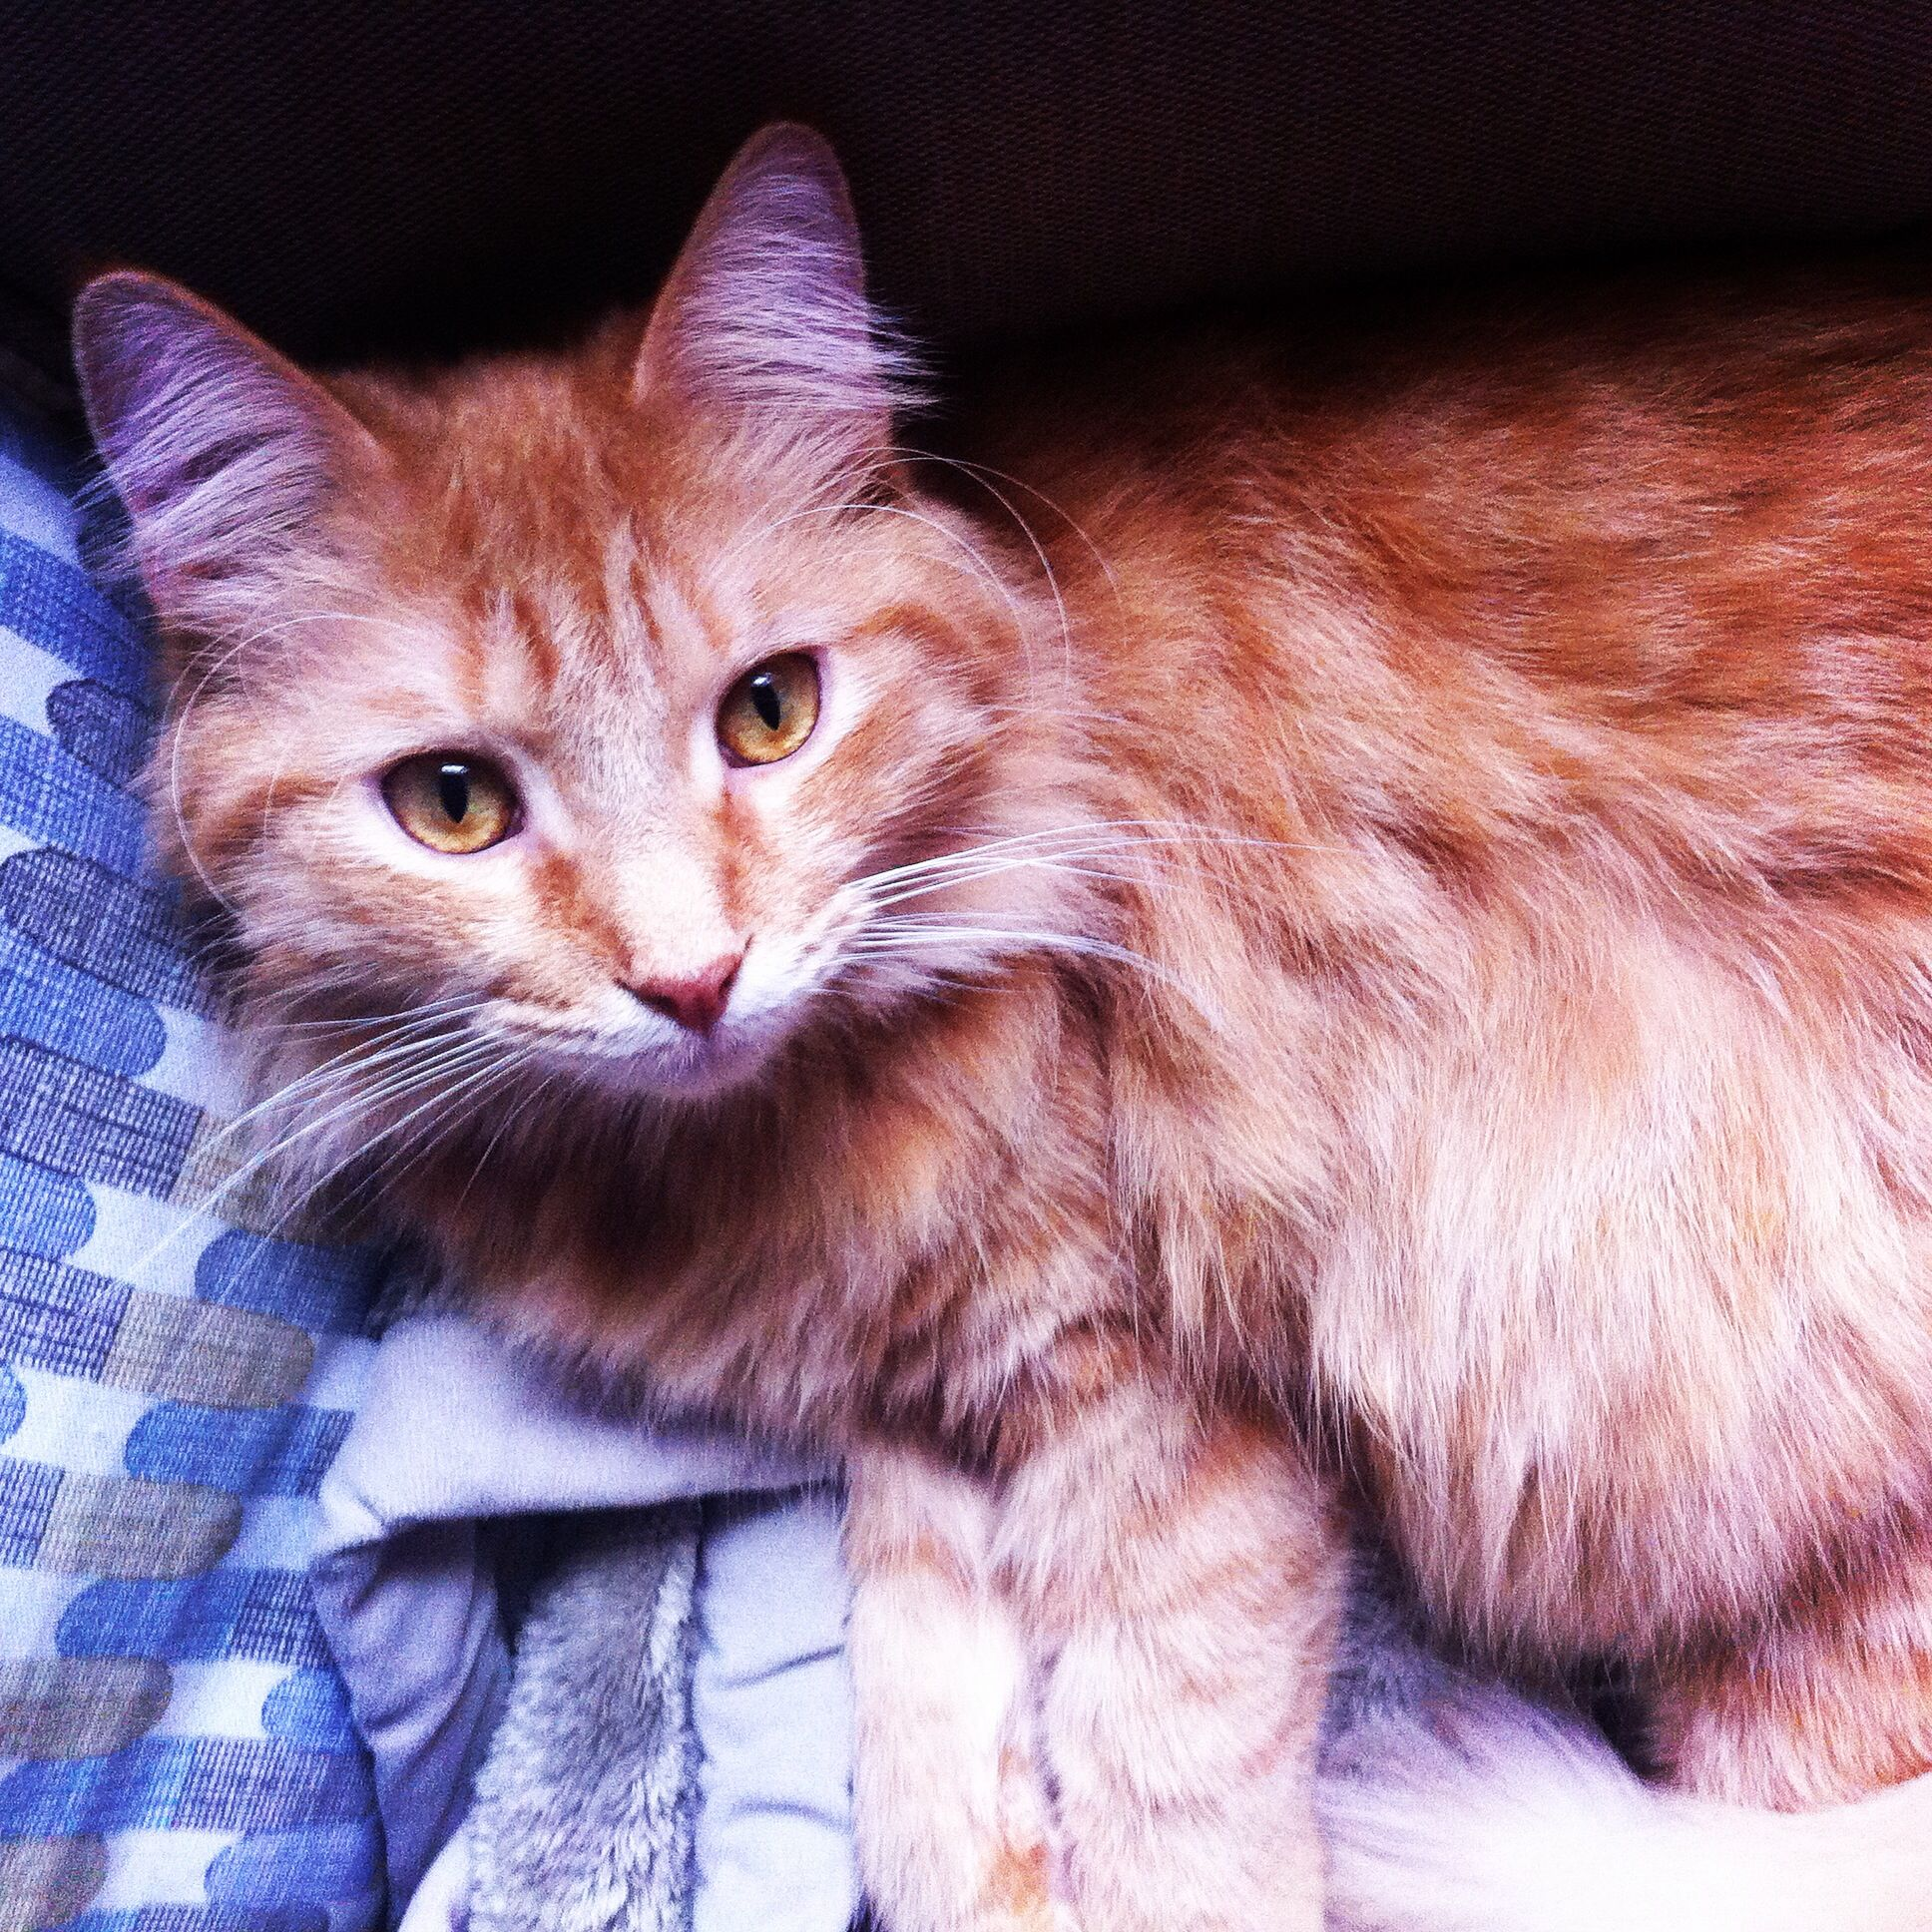 Kitty cat Charley